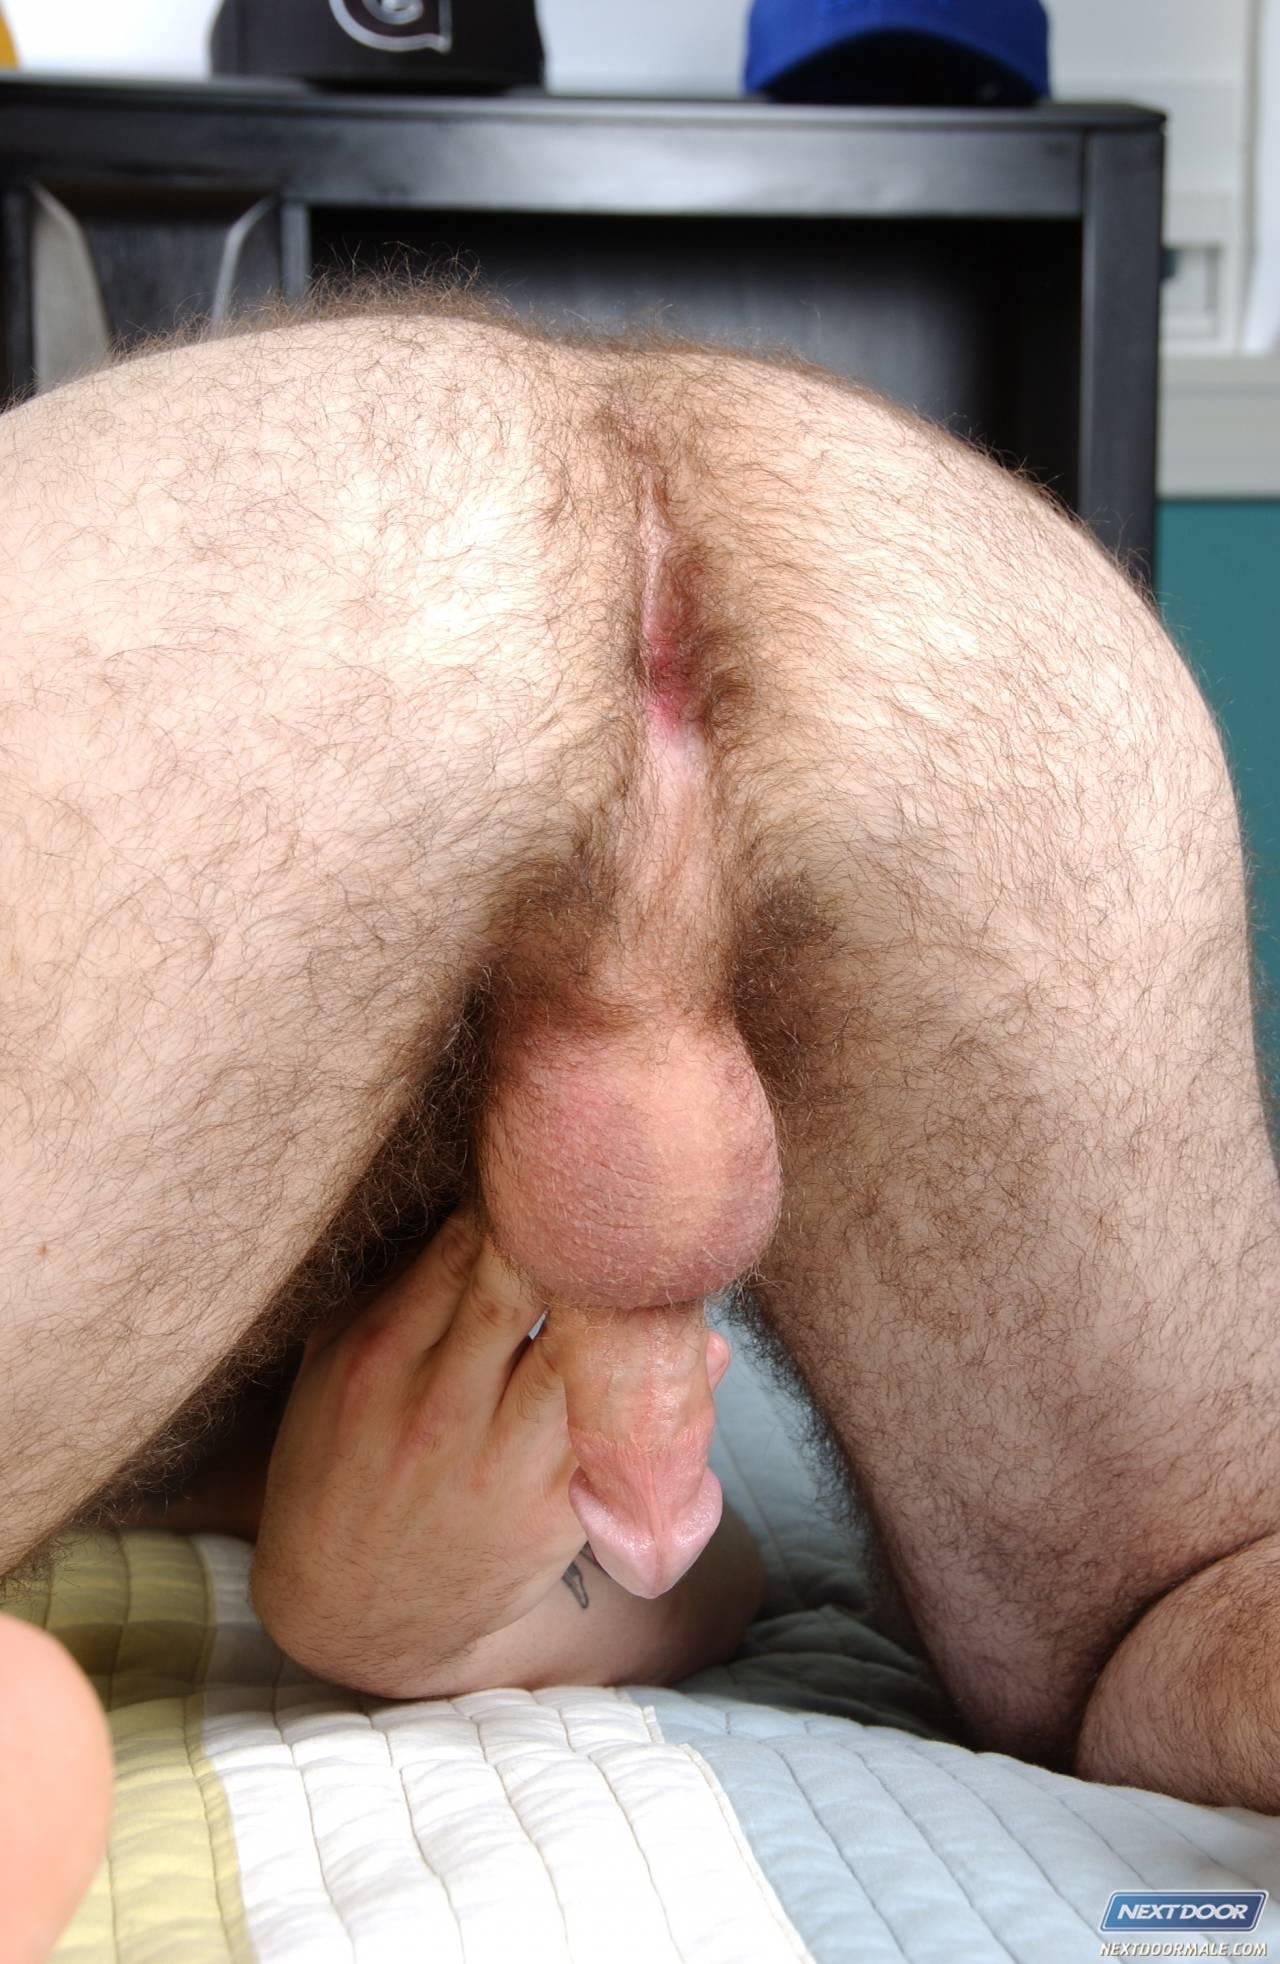 pics Asshole sex